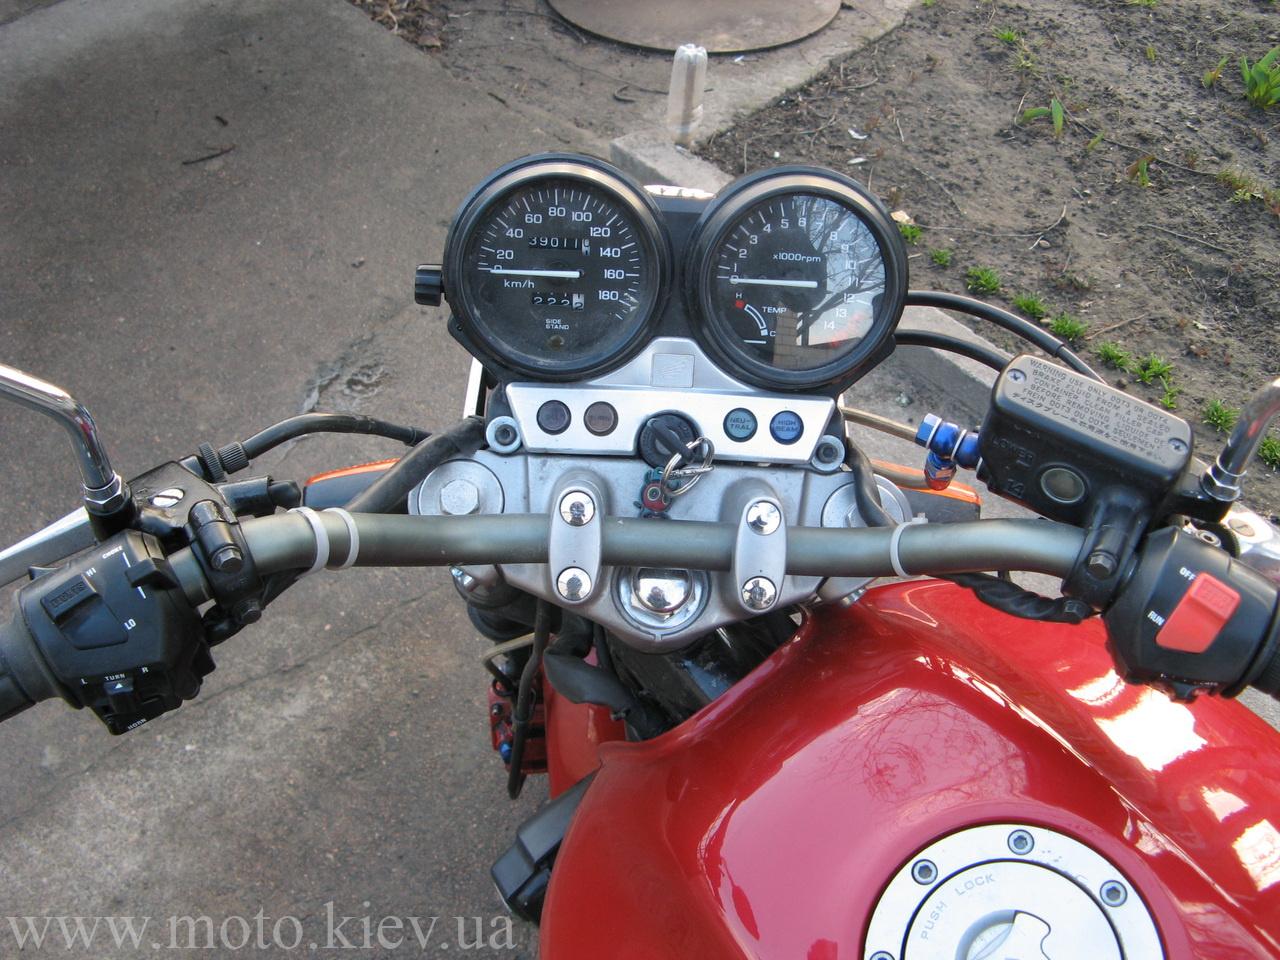 Новые мотоциклы Honda.